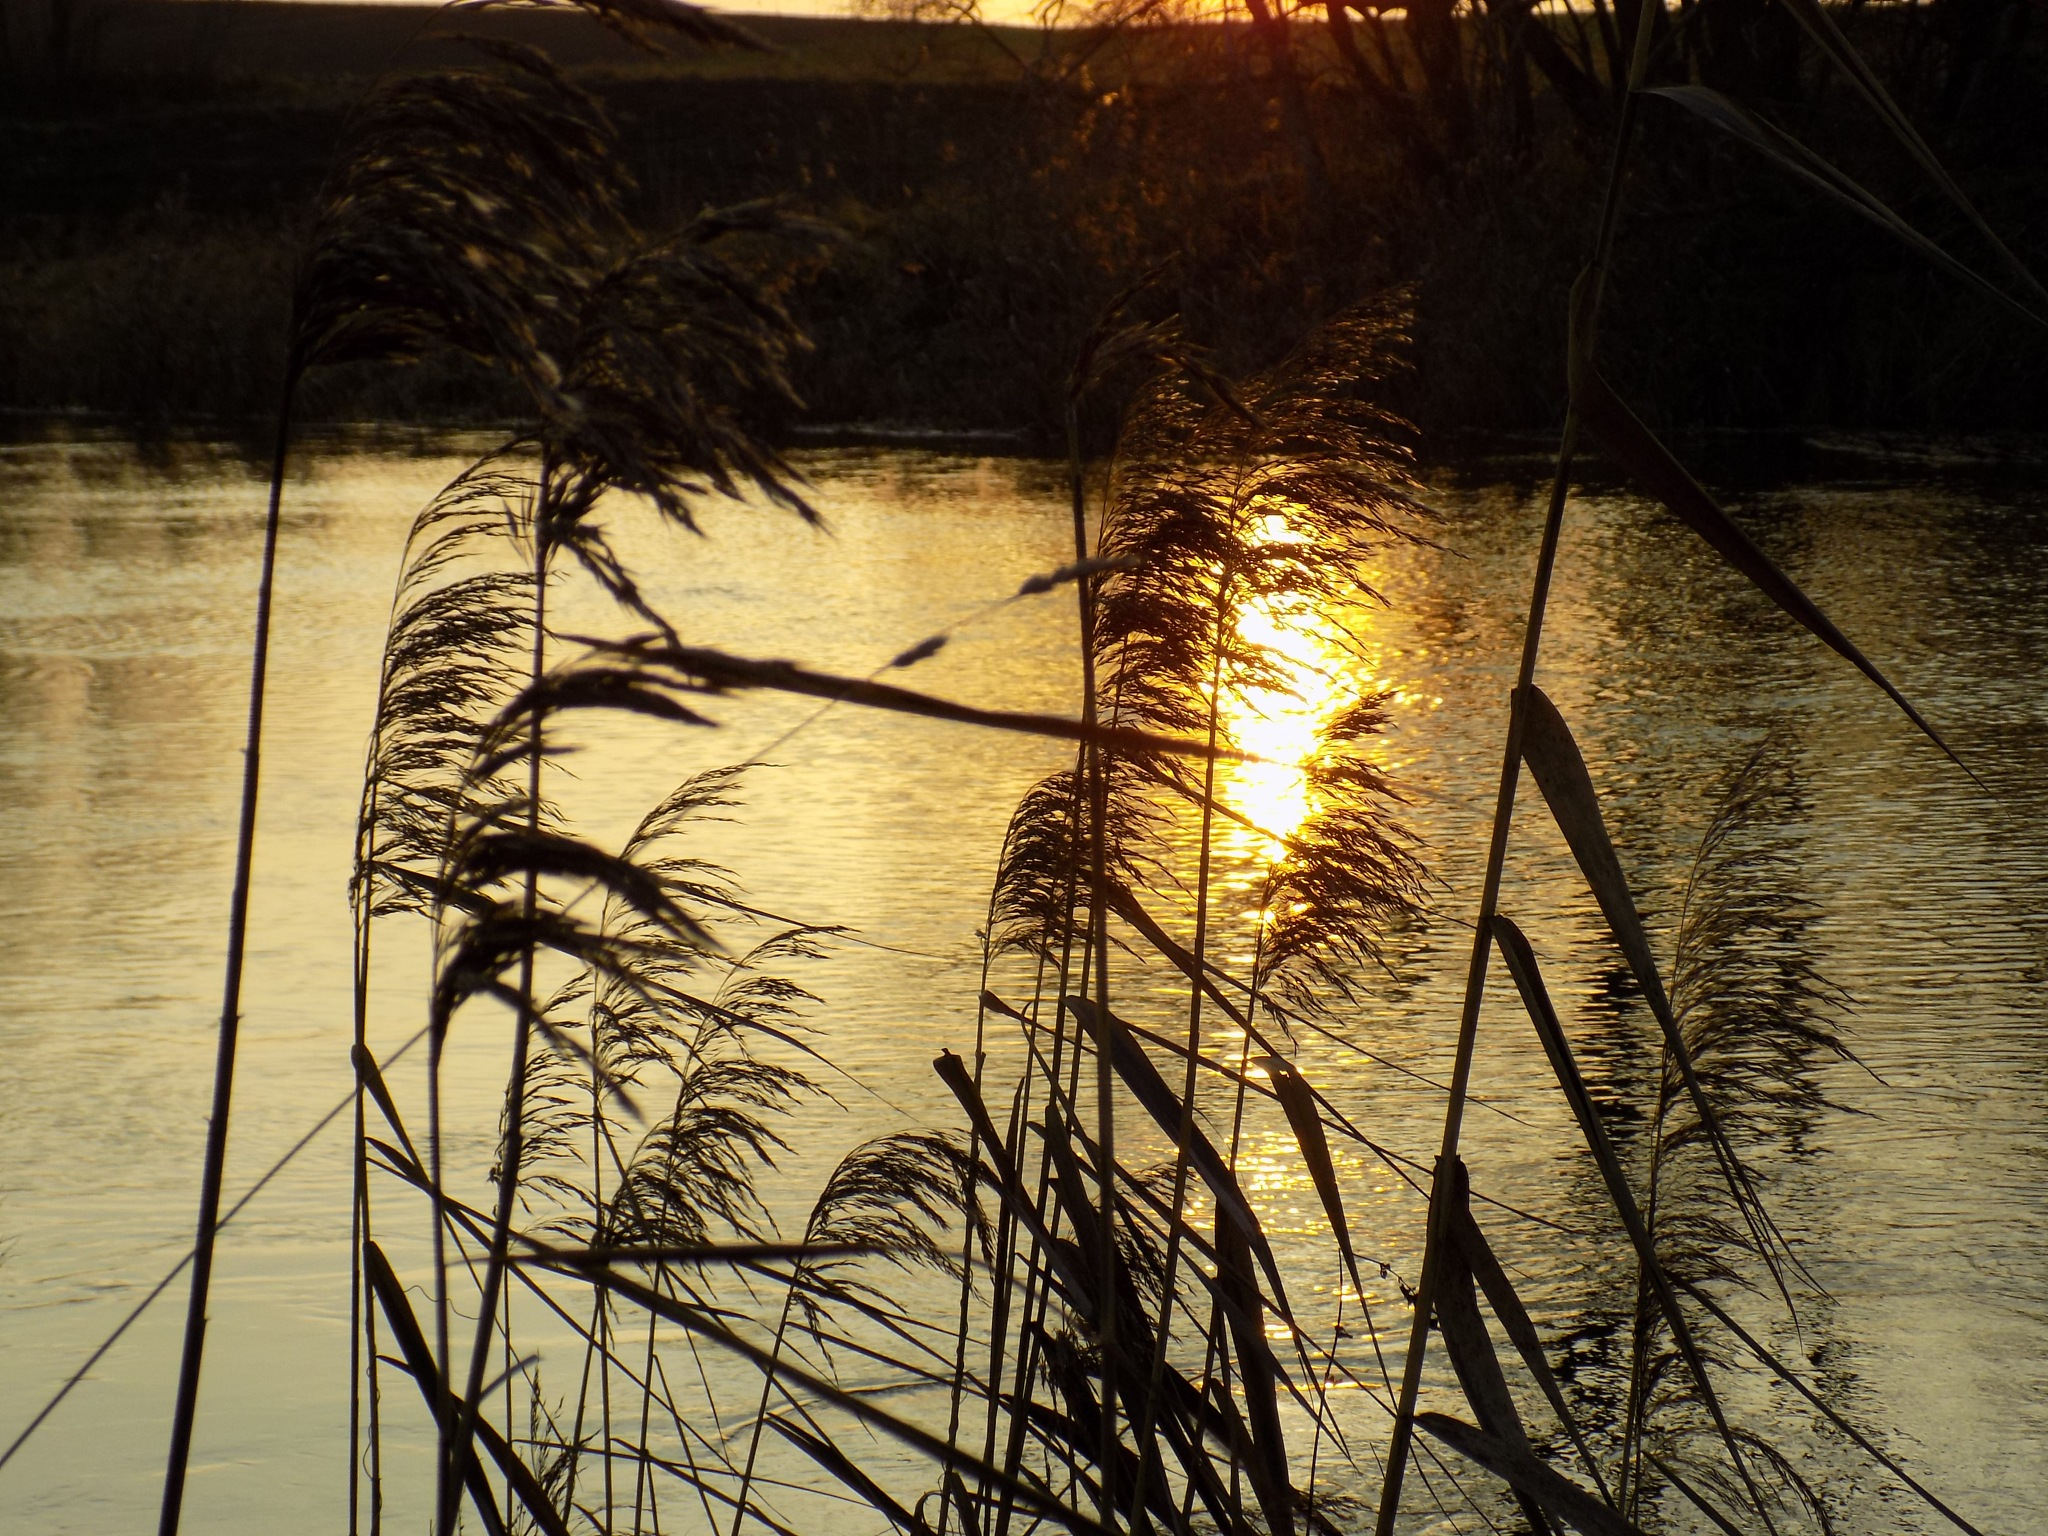 Sunset reflections by uzkuraitiene62